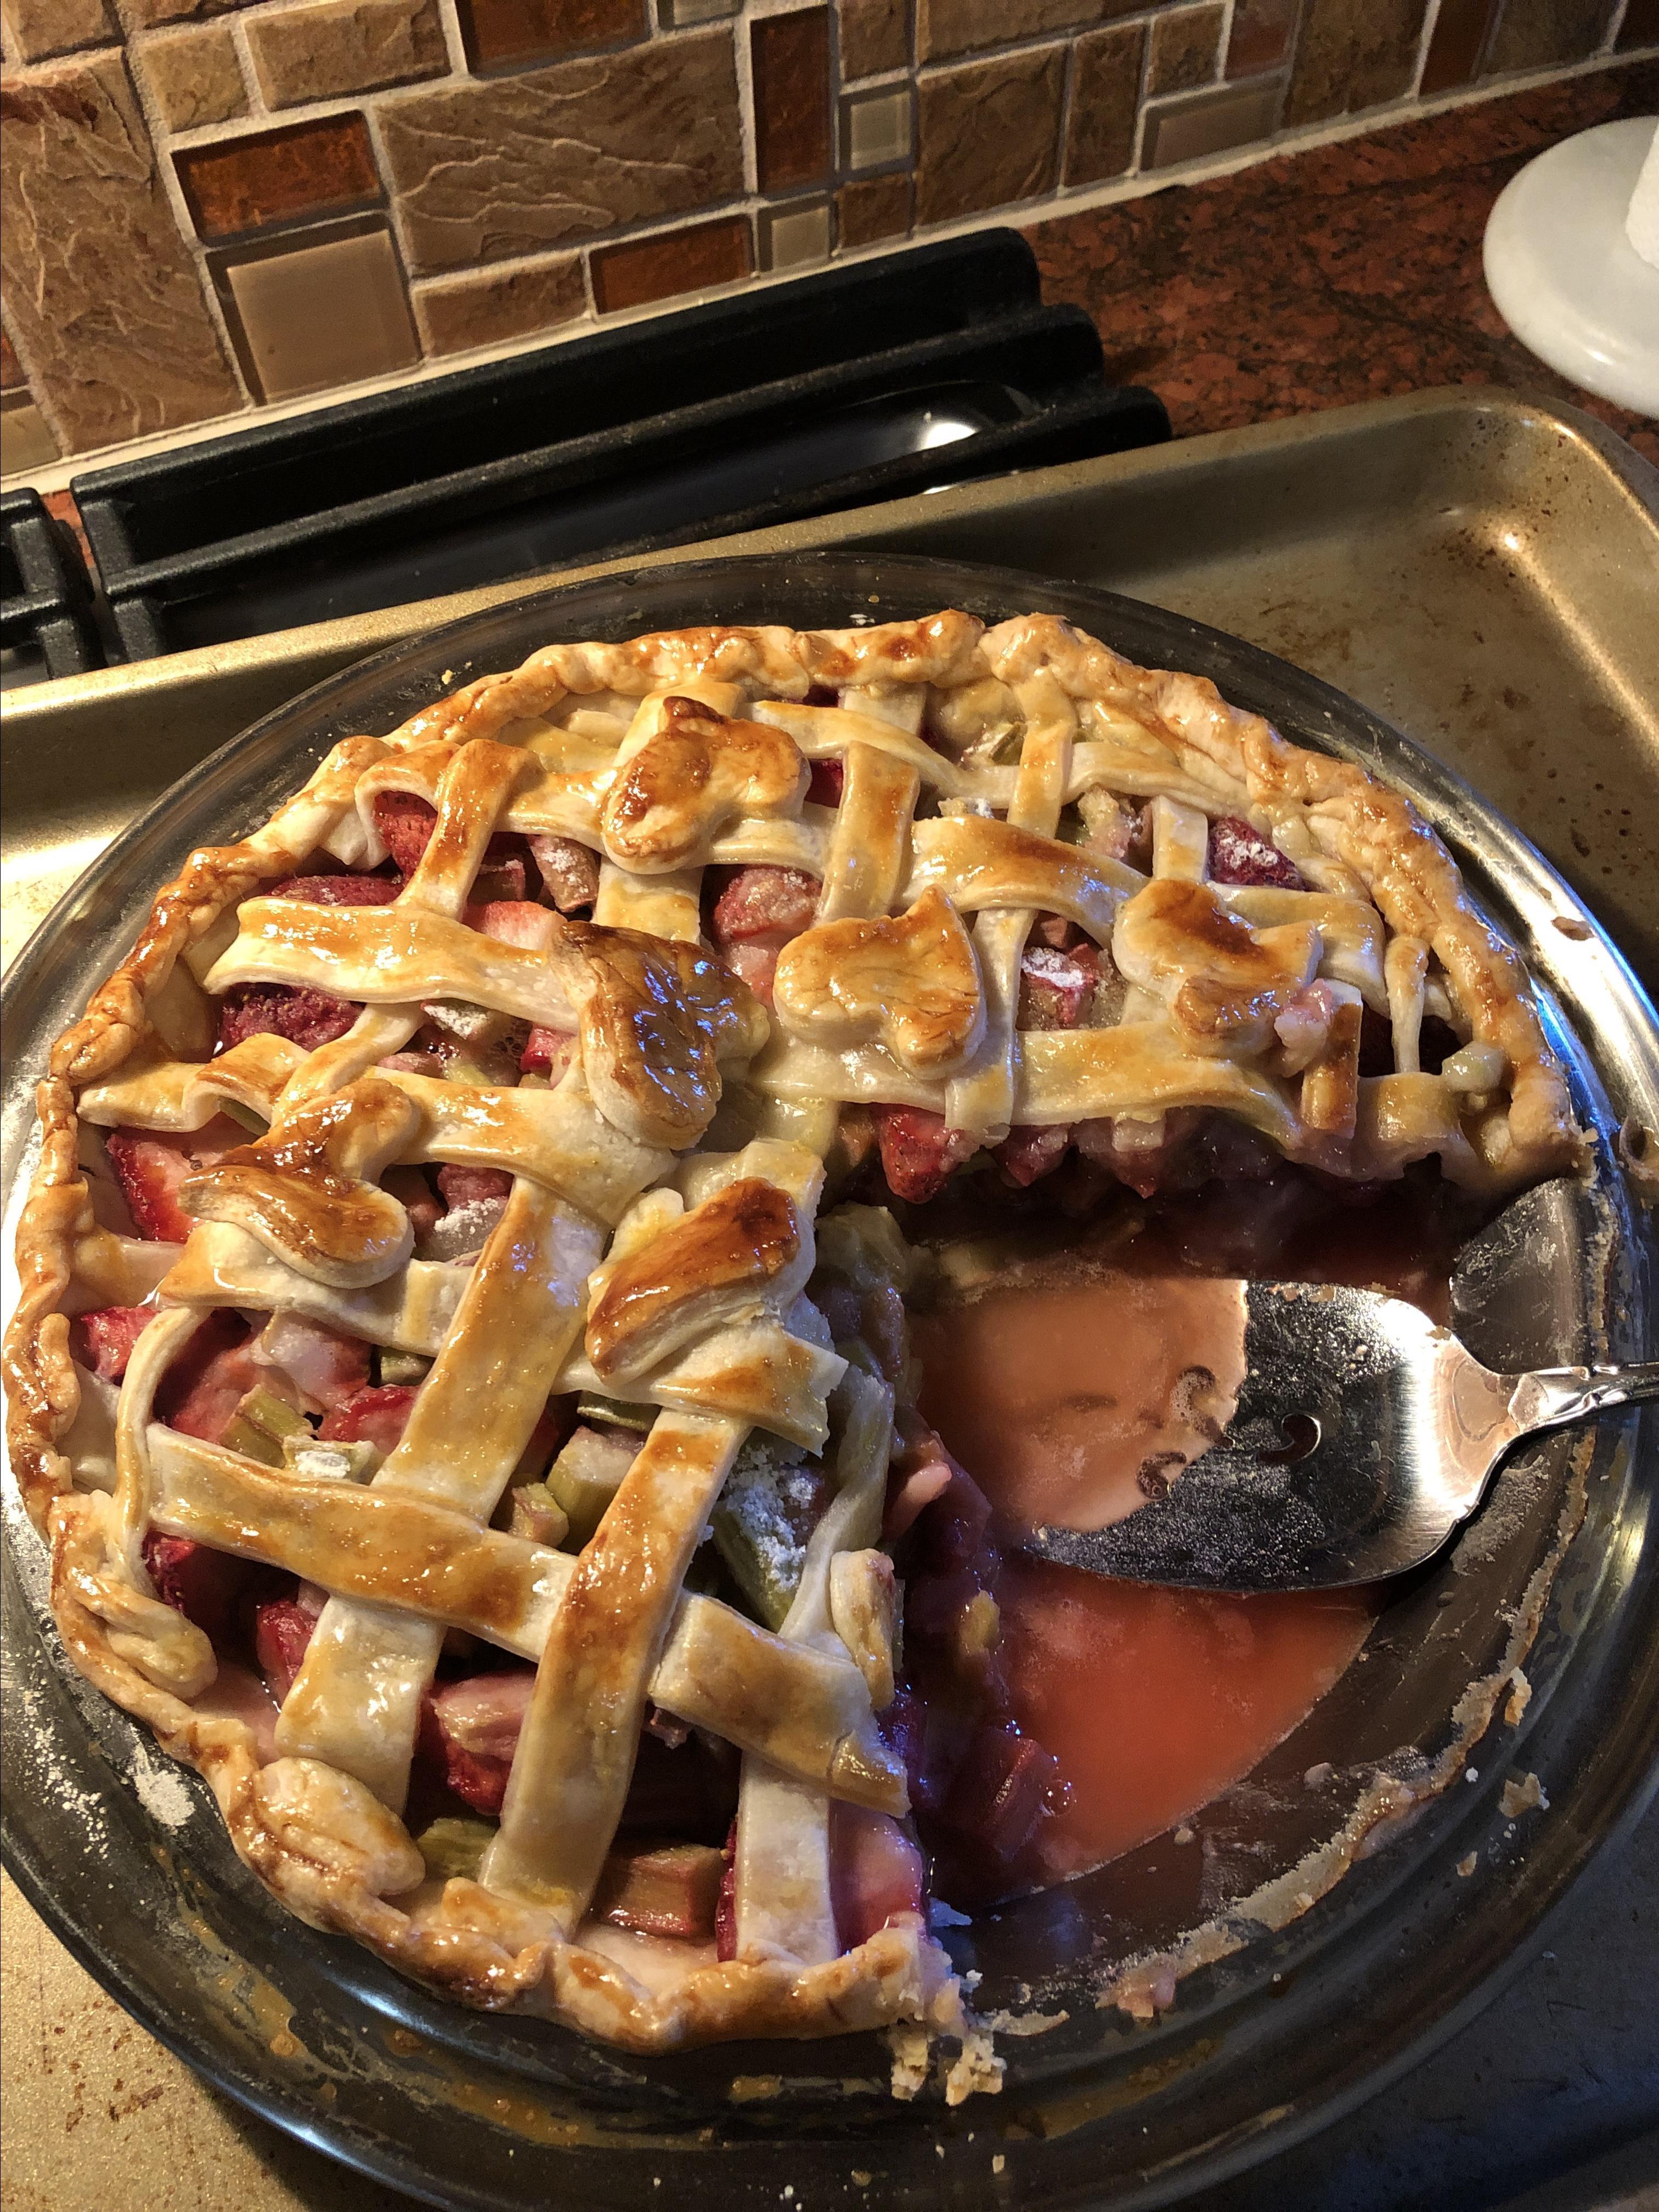 Rhubarb and Strawberry Pie Tracy Garant Stout